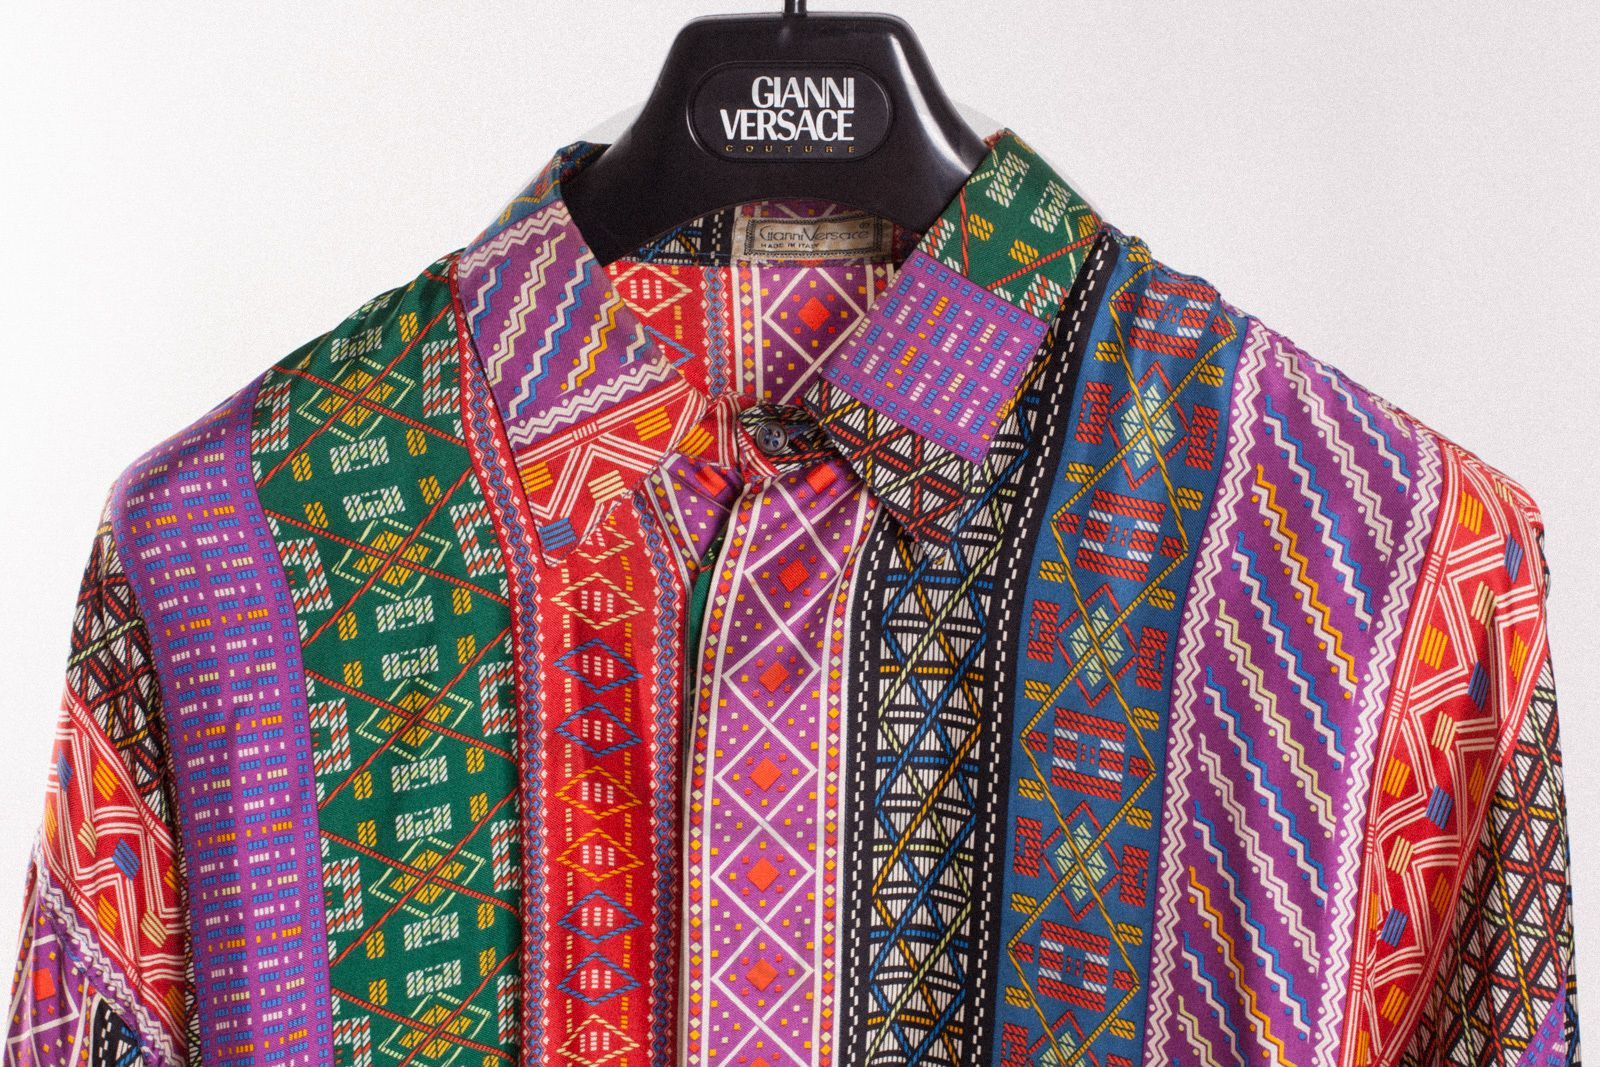 09e288184643 Gianni Versace silk shirt